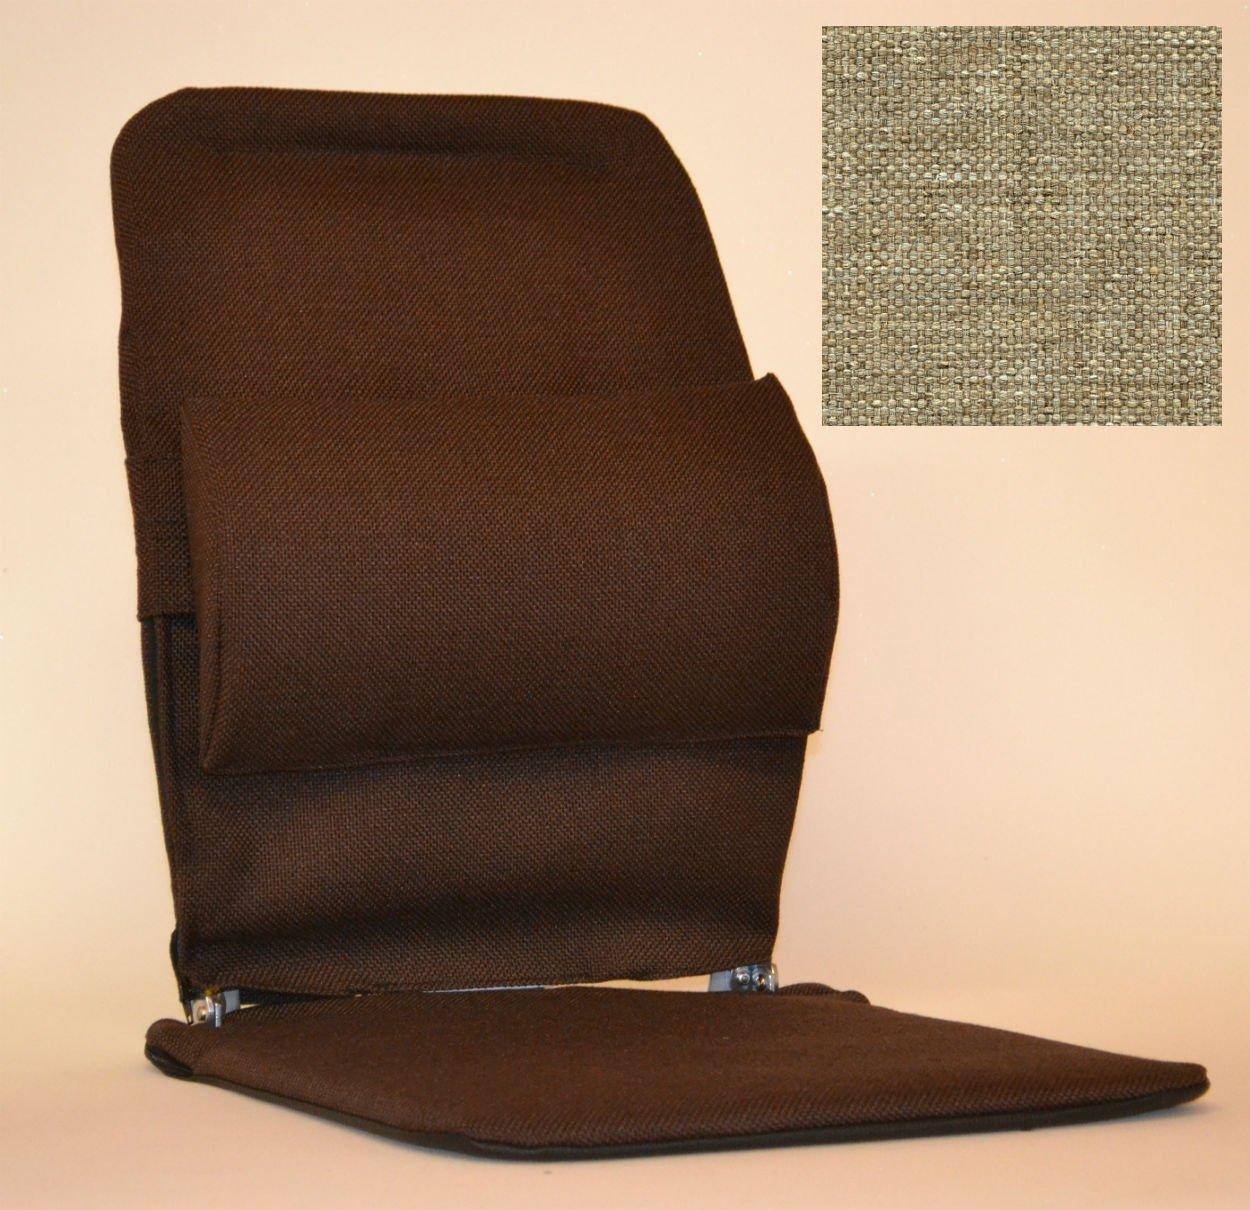 McCarty's Sacro-Ease Basic Back and Lumbar Support Cushion